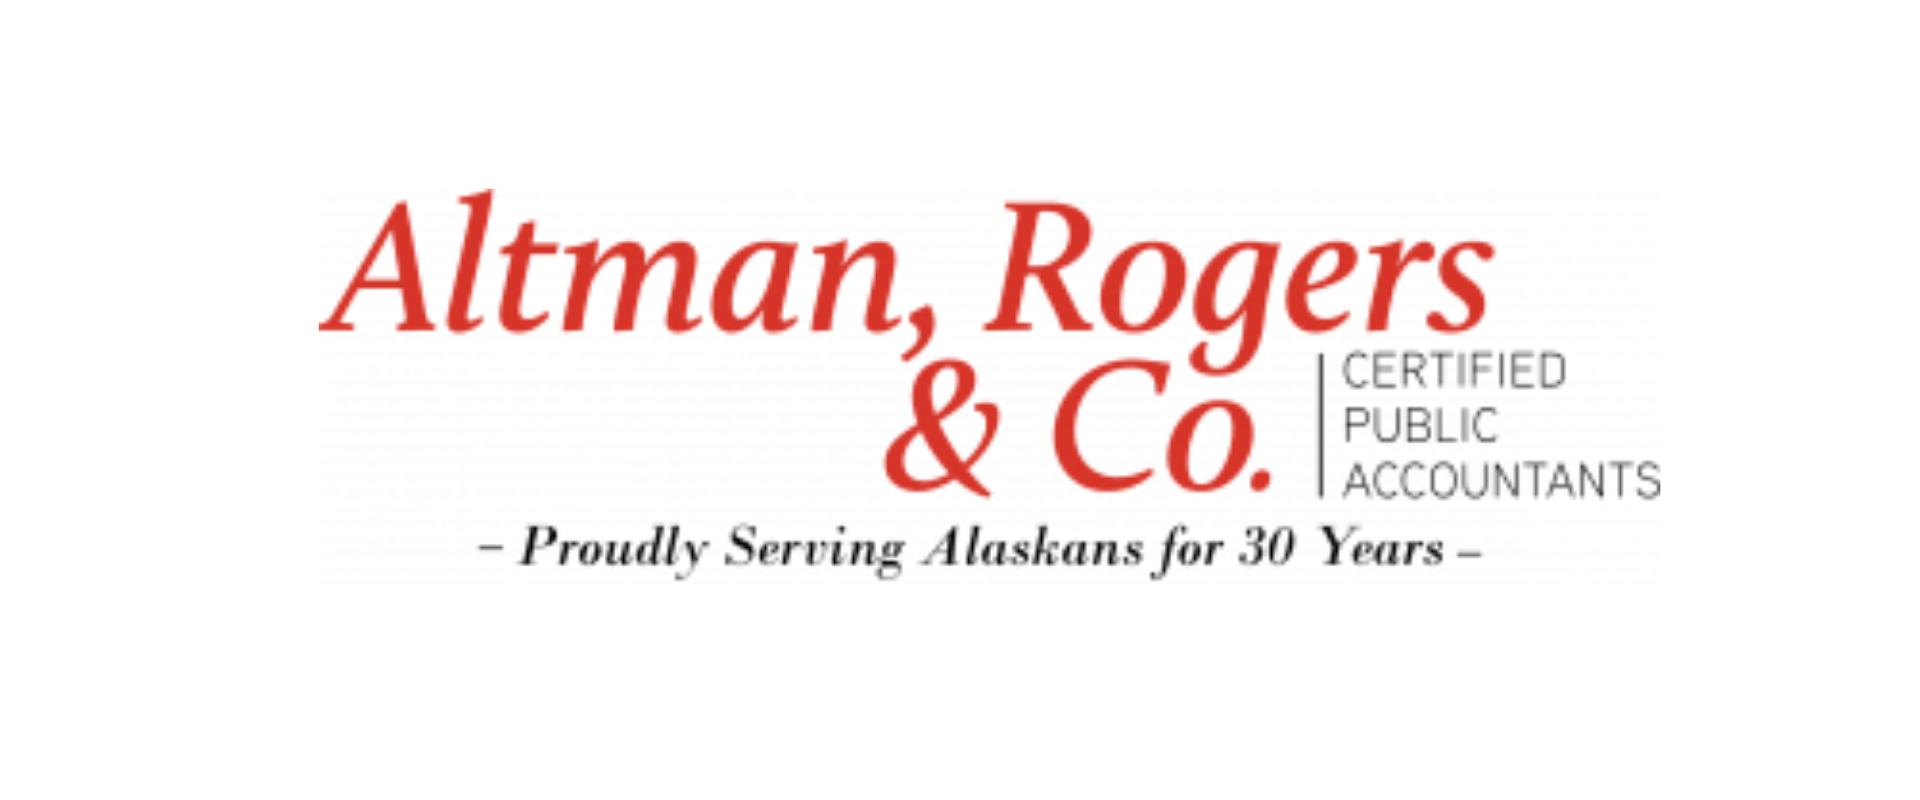 Altman, Rogers & Co.